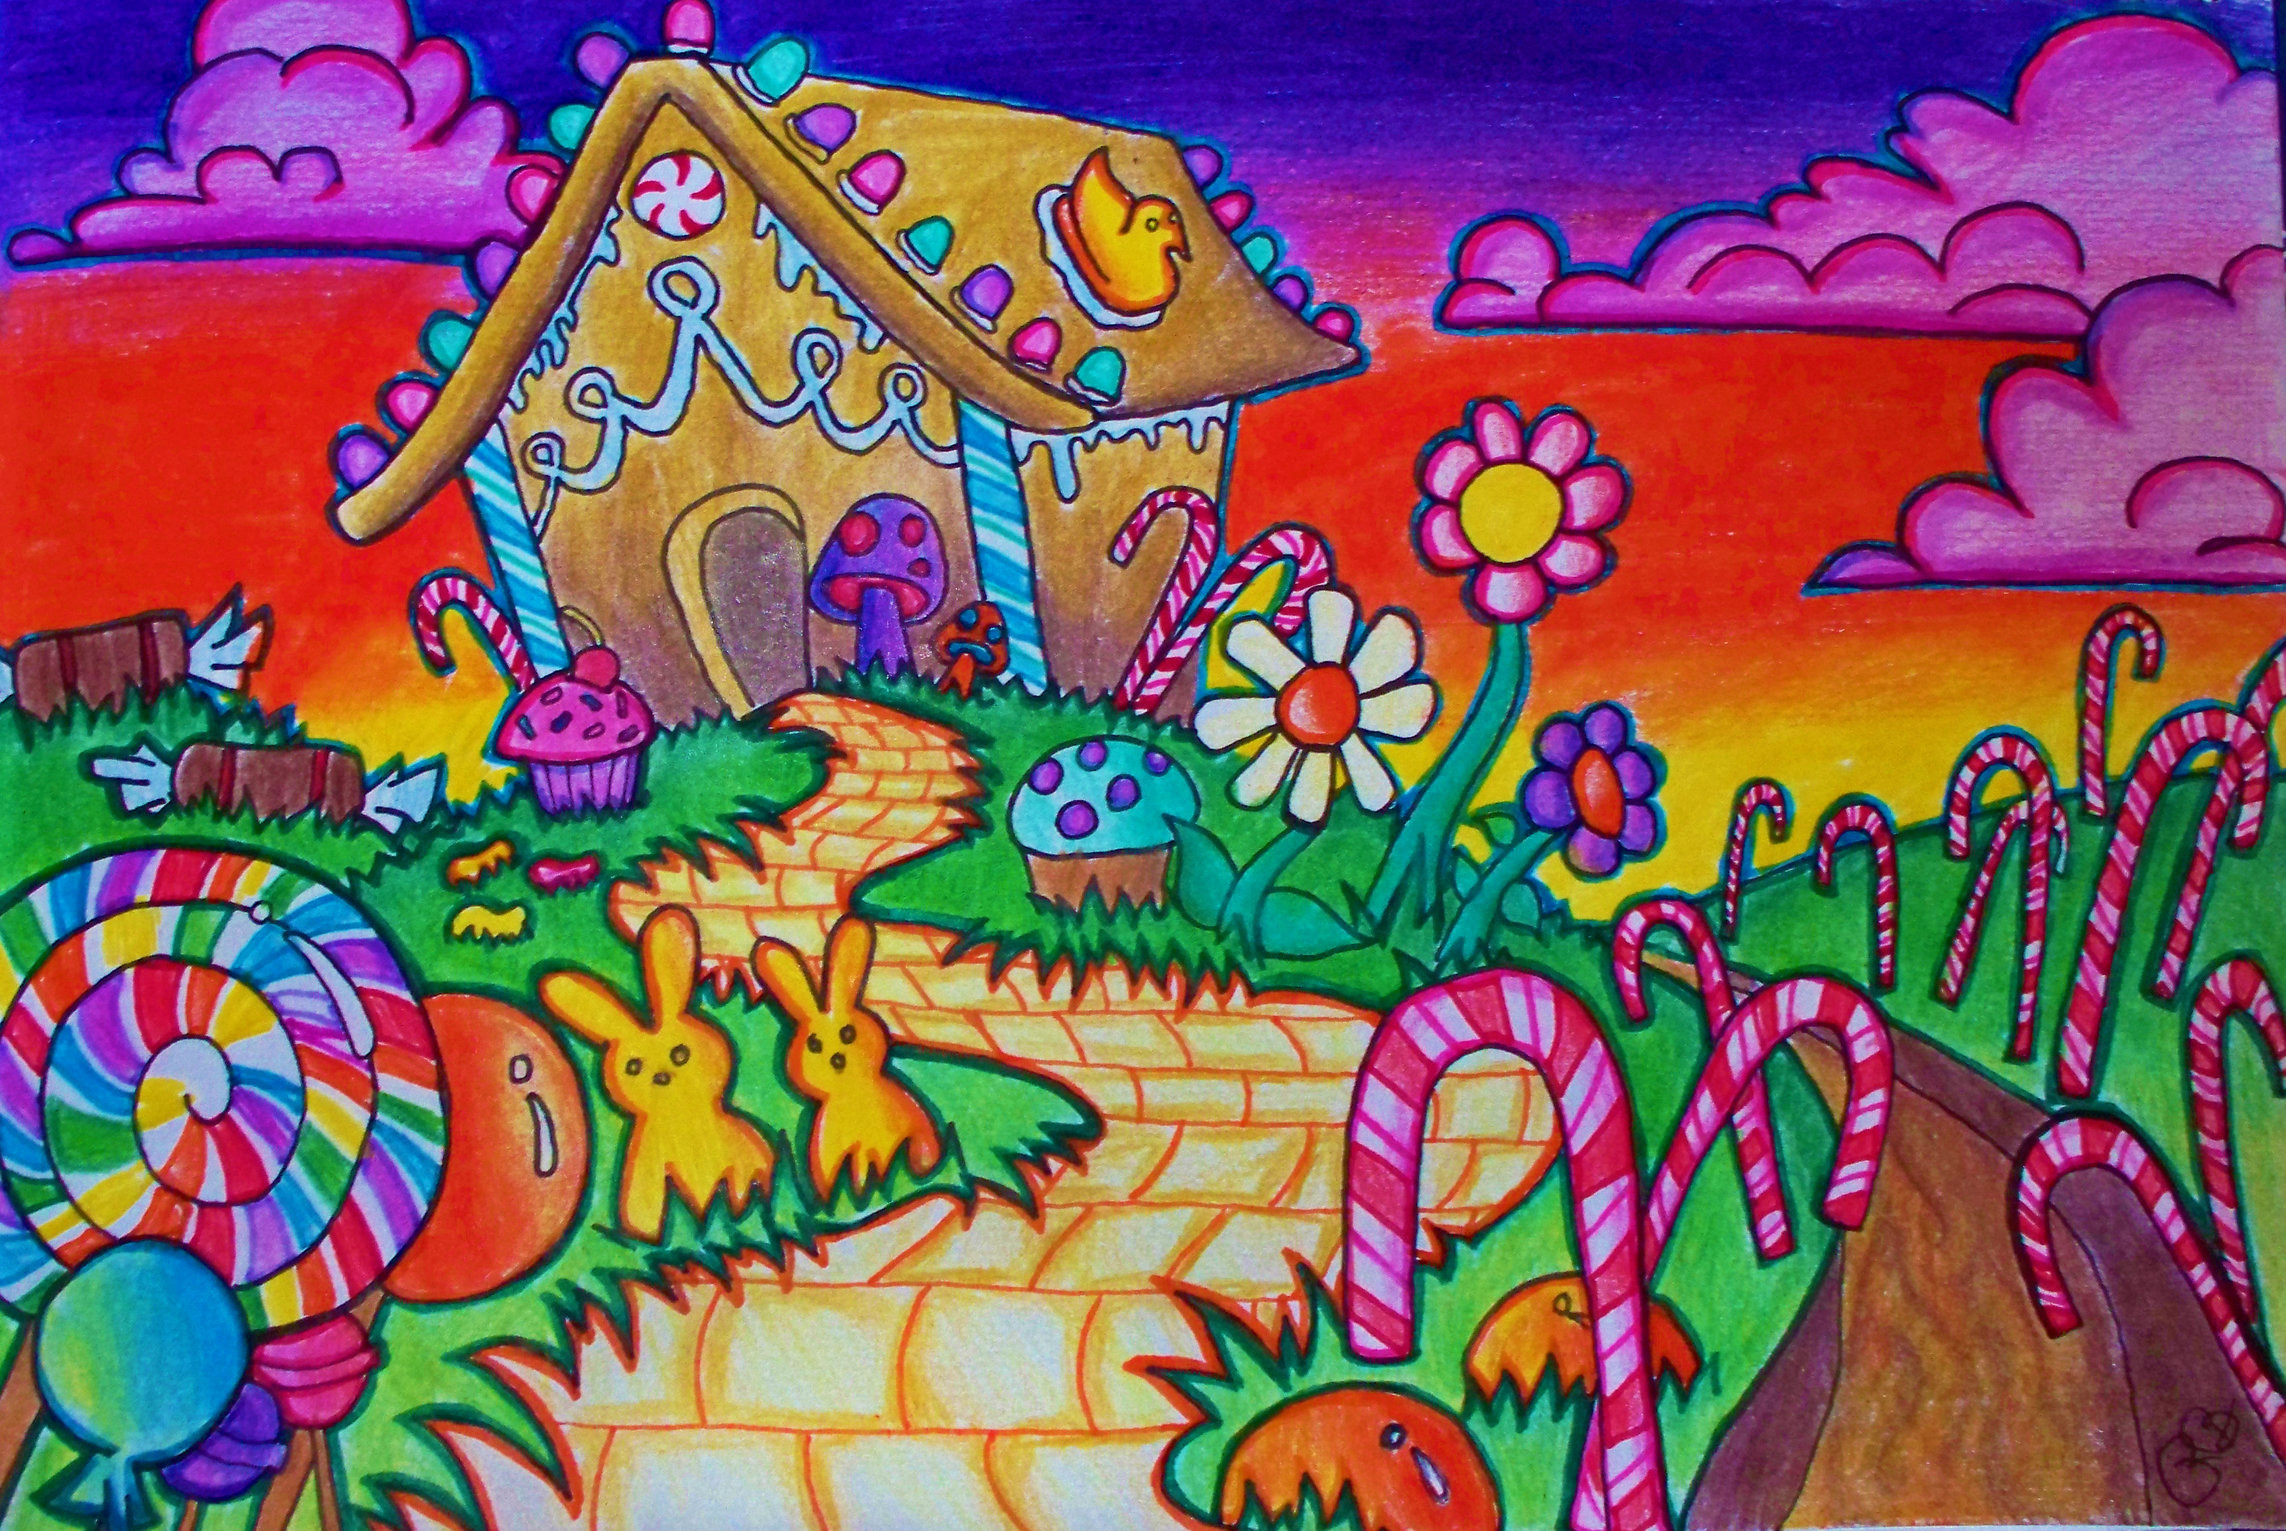 Candyland Wallpaper 183 ① Wallpapertag